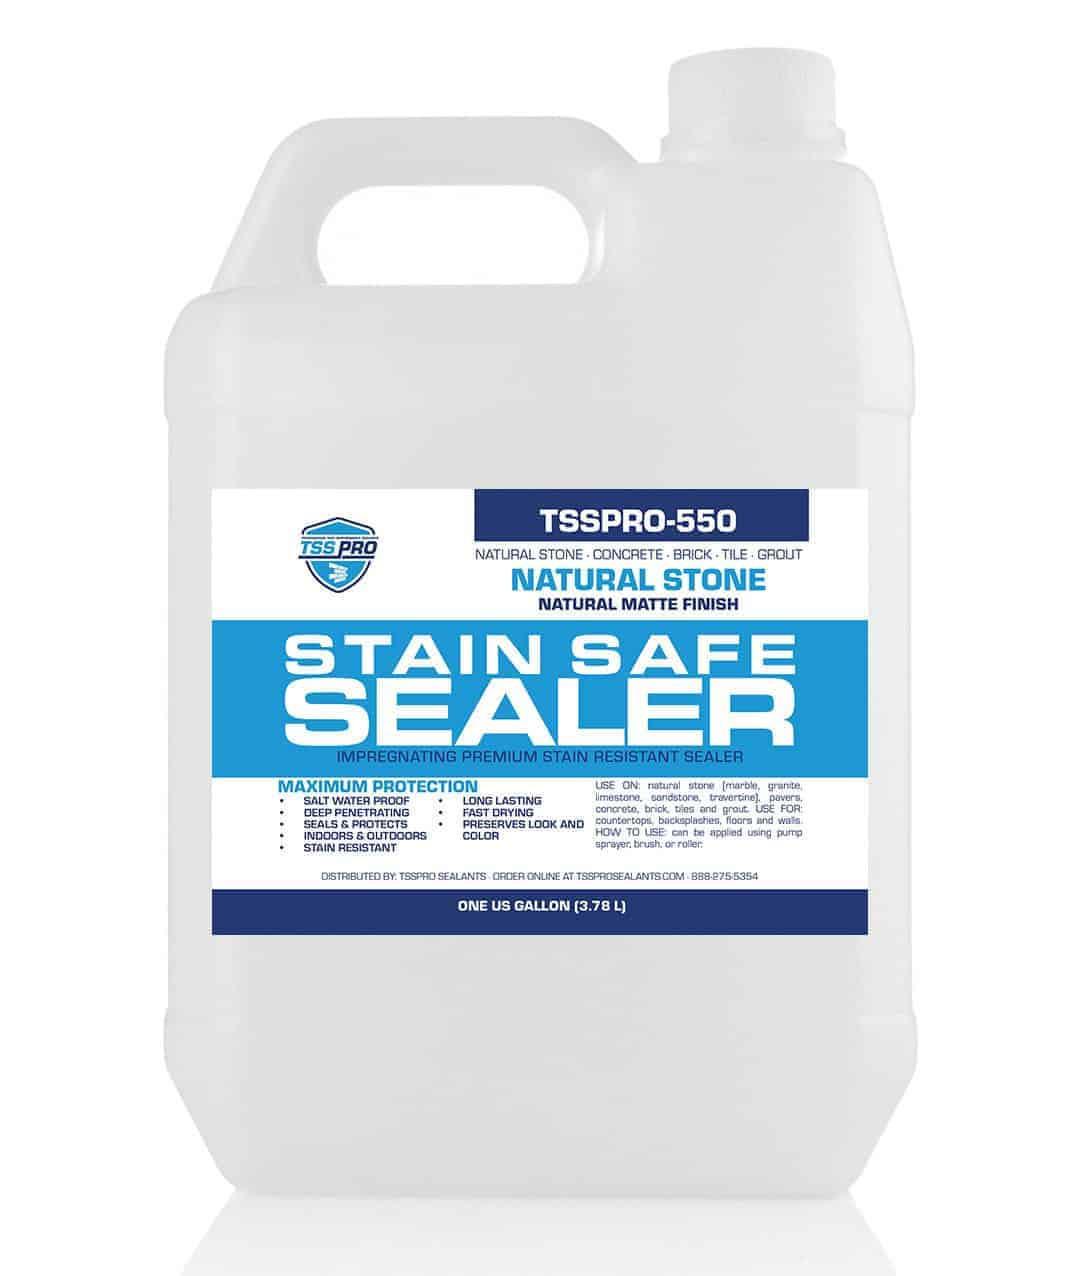 tsspro 550 stain safe sealer